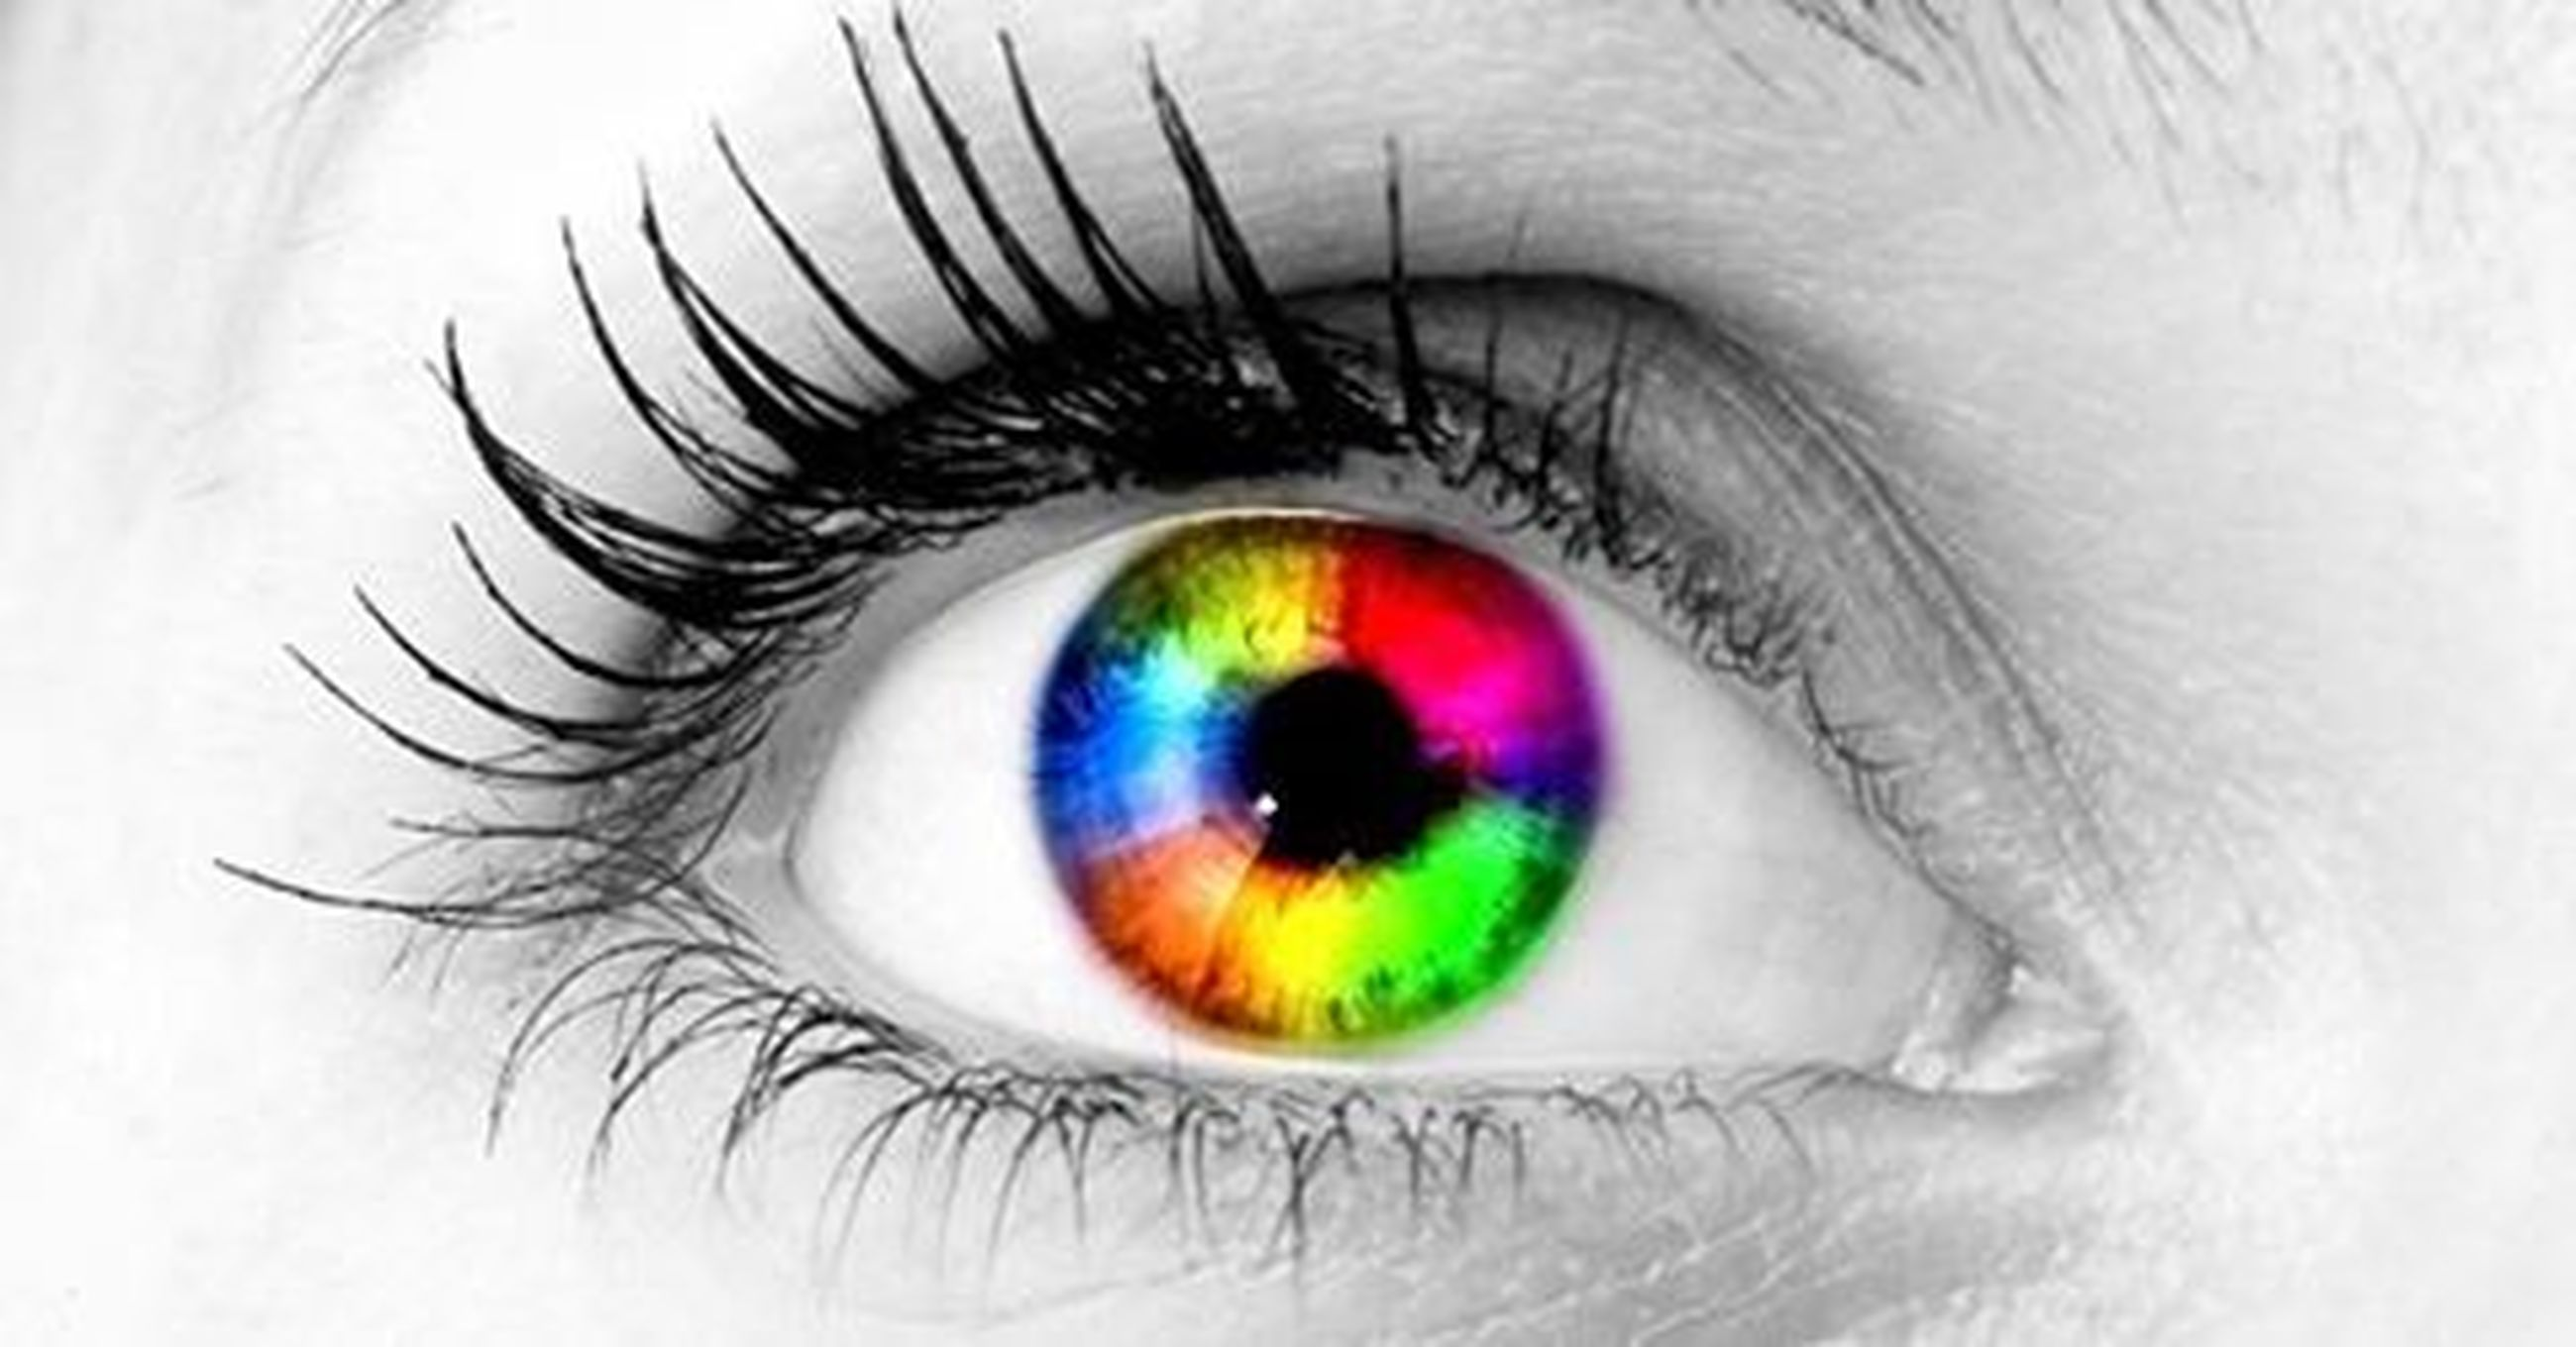 human eye, close-up, eyelash, eyesight, sensory perception, part of, eyeball, looking at camera, iris - eye, portrait, unrecognizable person, extreme close-up, vision, eye, extreme close up, cropped, human skin